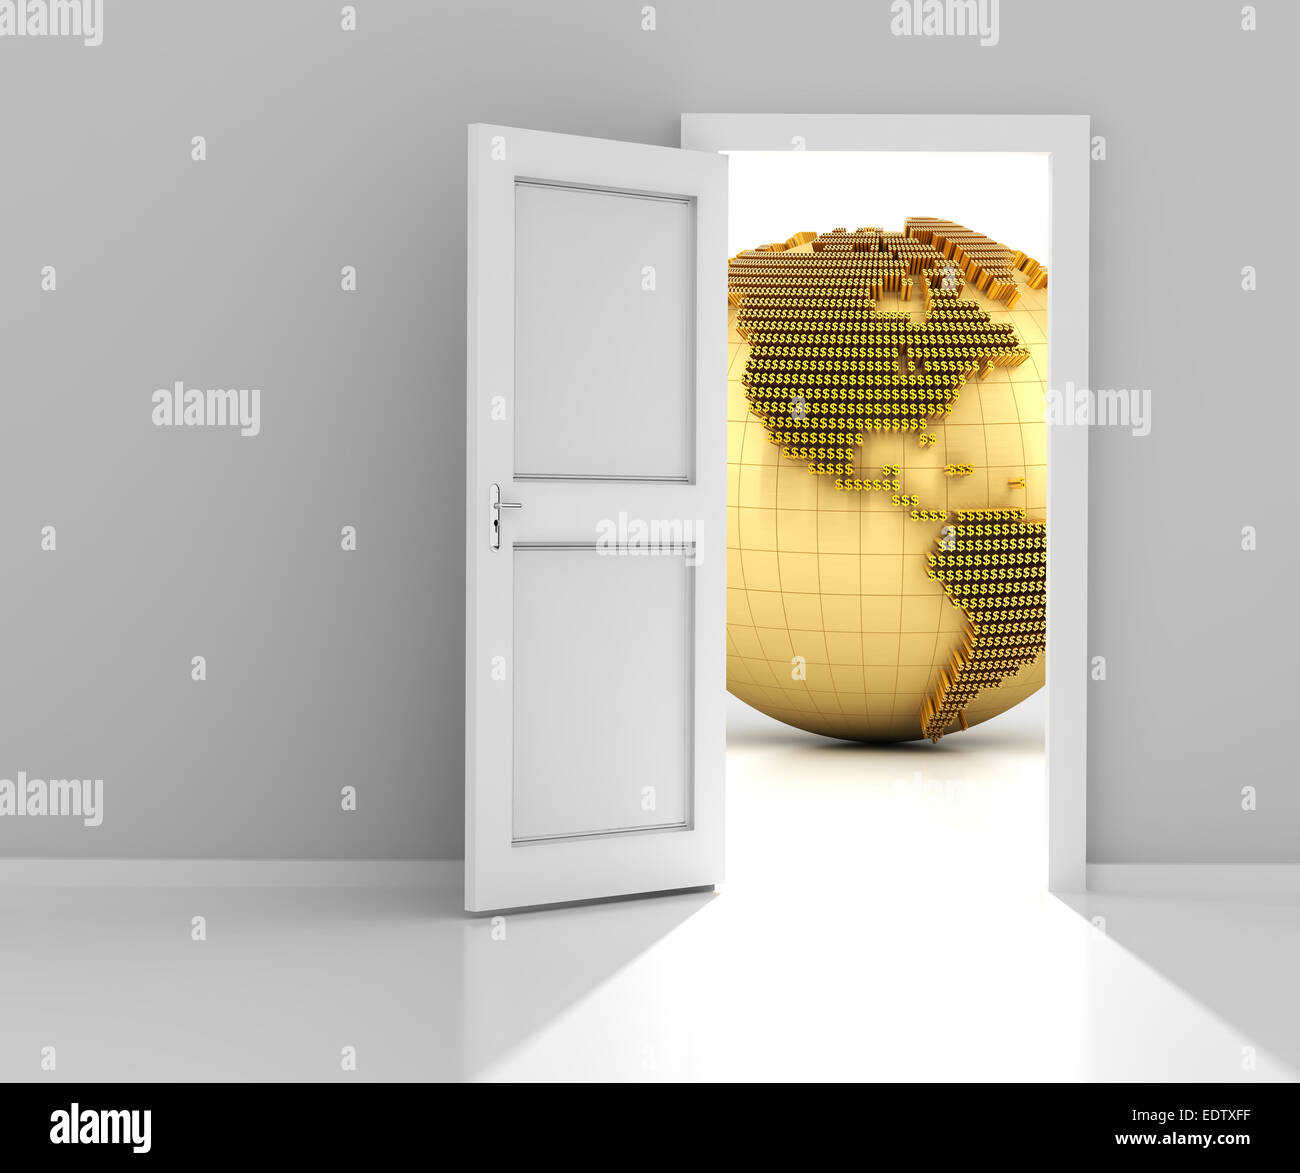 Tür der Finanzwelt, 3d render Stockbild